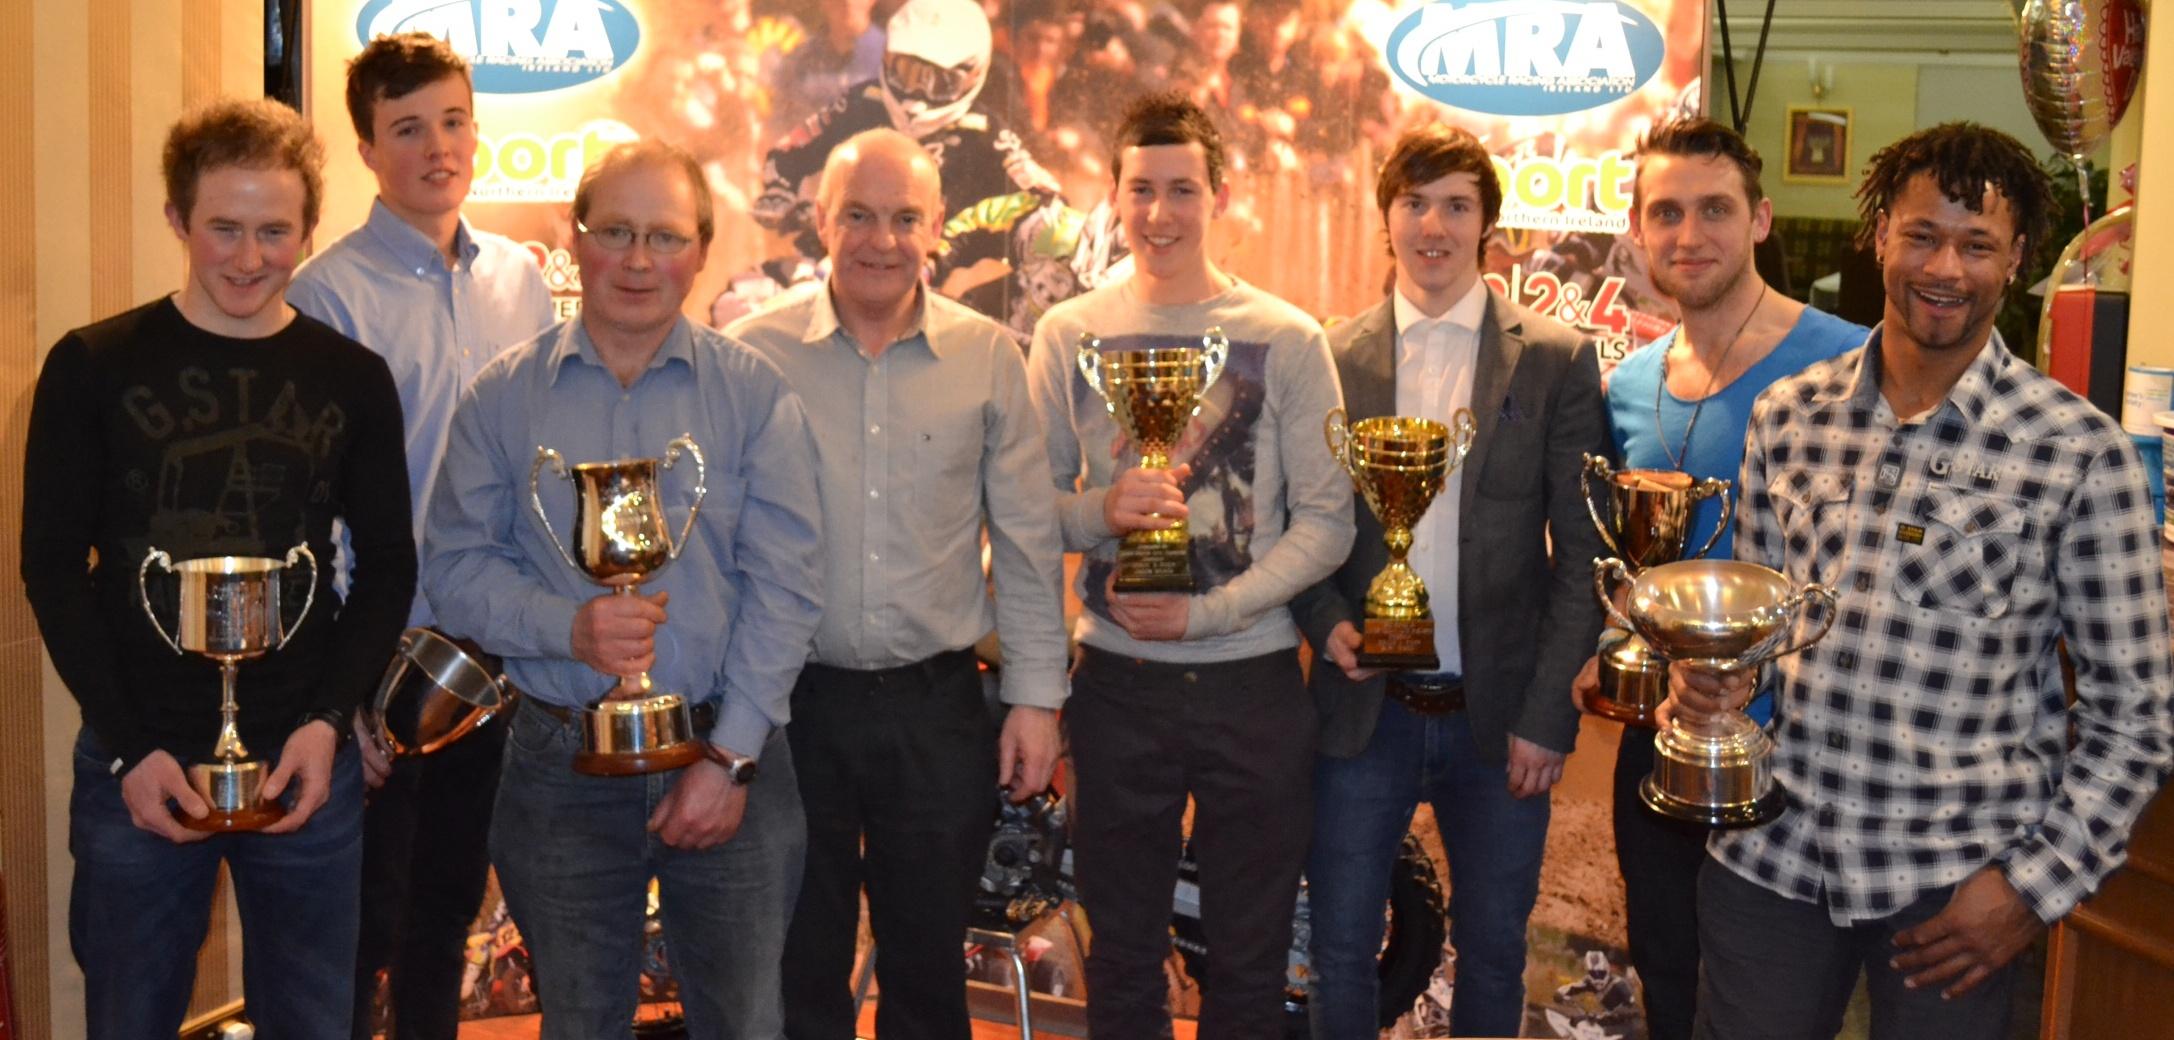 Prize Winners (L to R) David Gorman, Scott Leaney, Terry McCann, Billy McLarnin (Chairman), Callum Meara, Gary Gibson, Donal Teague, Steven White